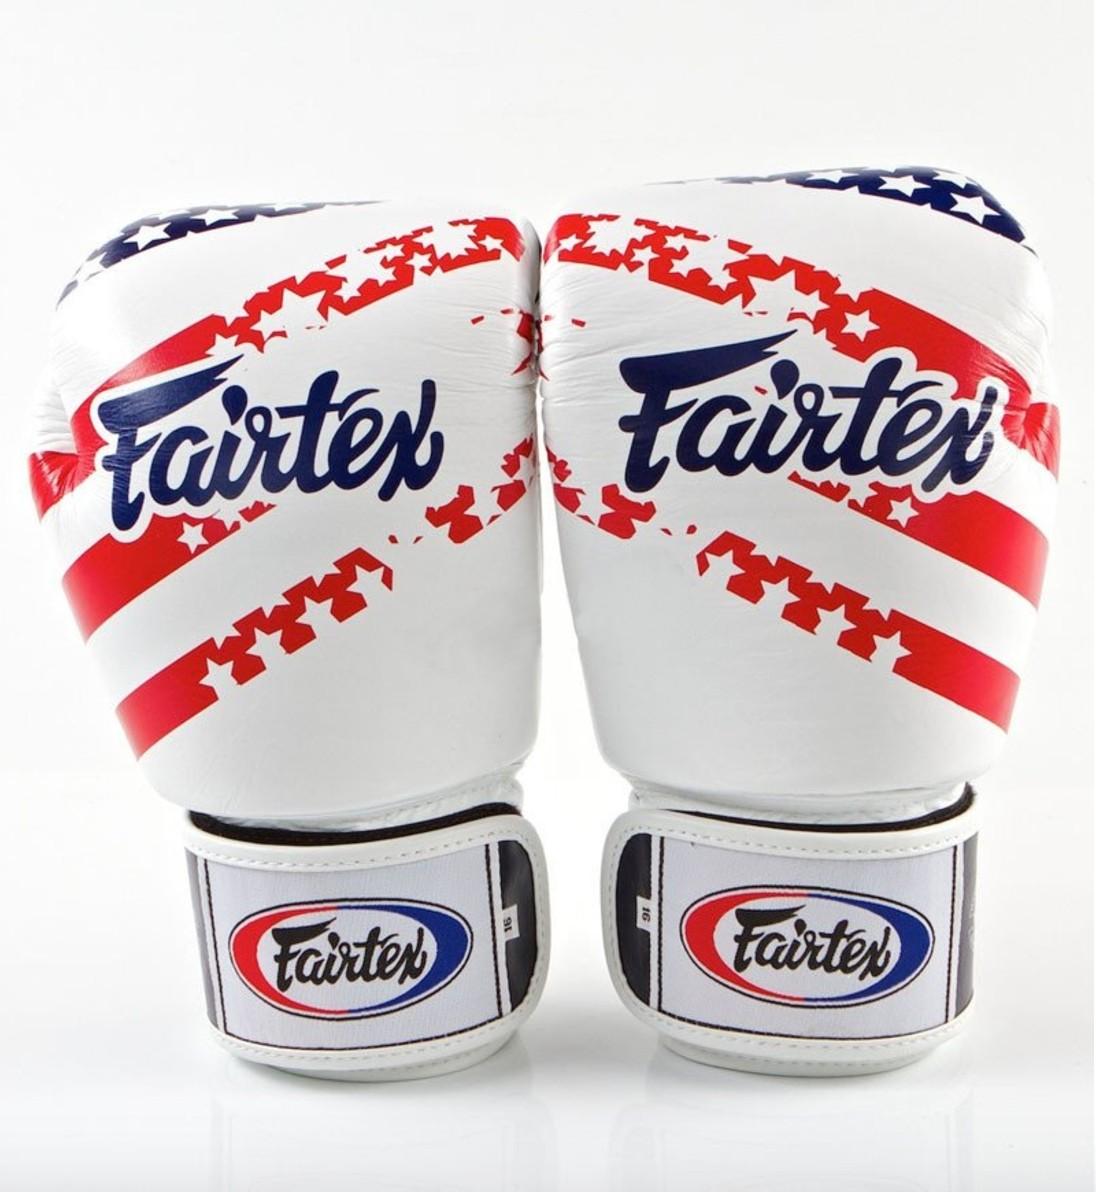 Fairtex | 限量款 美國國旗 拳擊手套 (BGV1 USA flag)-12oz